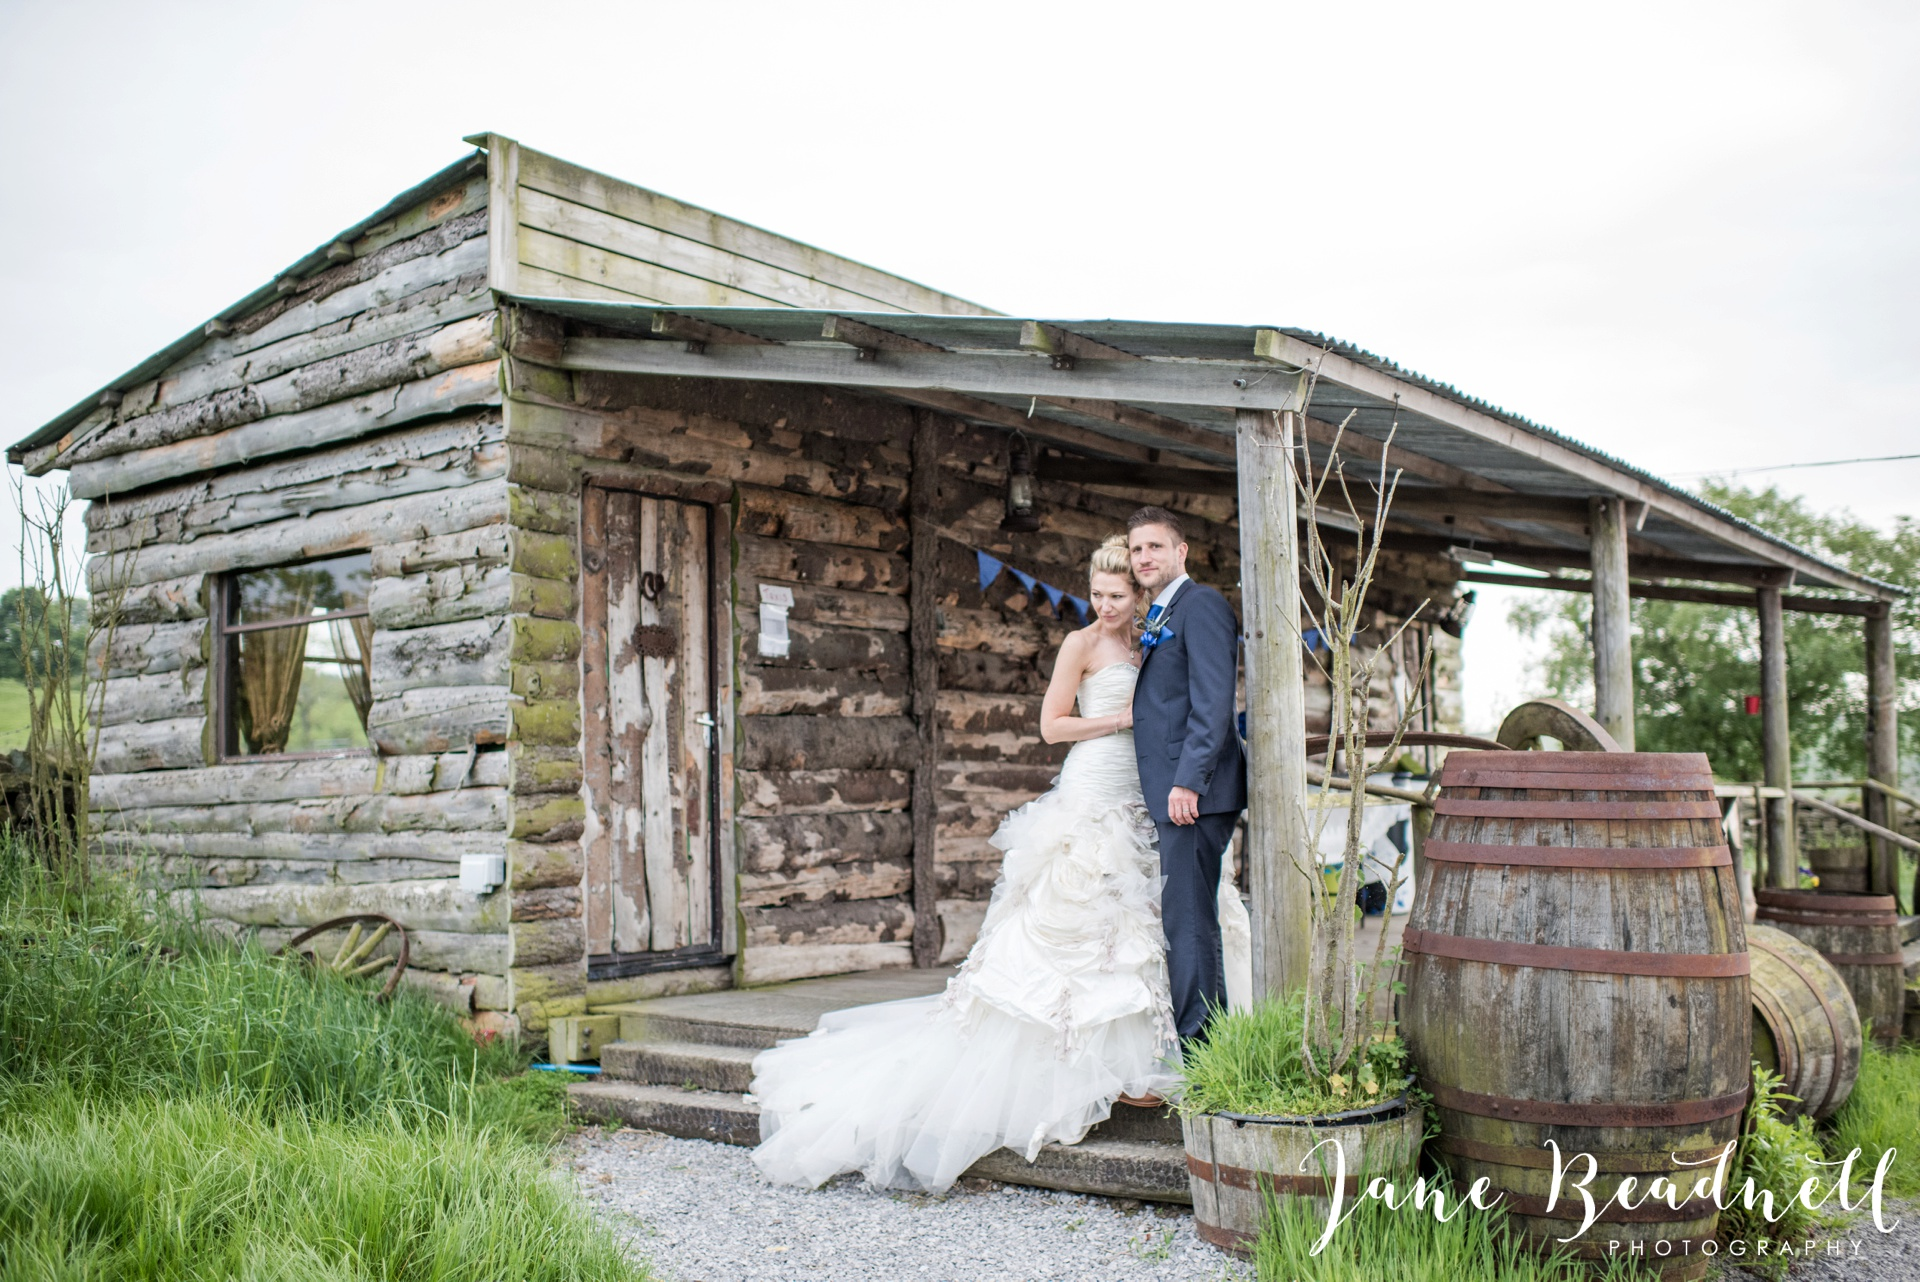 Hill Top Farm Wedding Photography Masham by Jane Beadnell Photography_0072